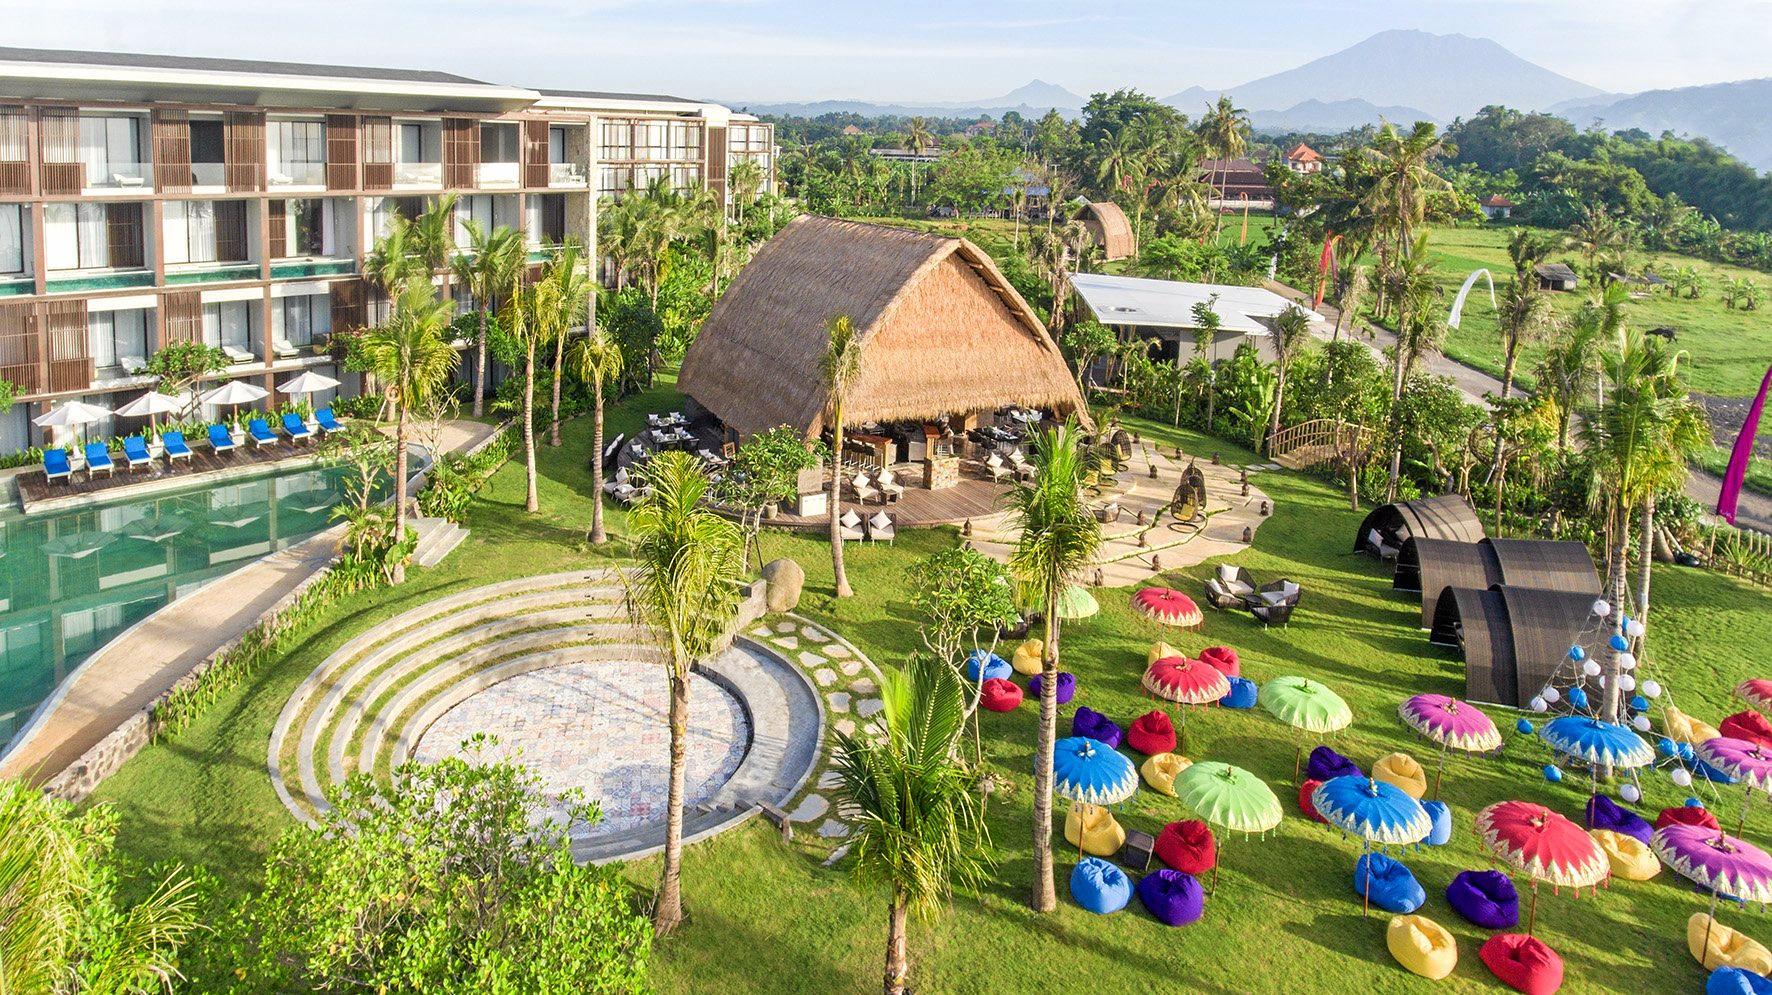 The Wyndham Jivva Resort in Bali.